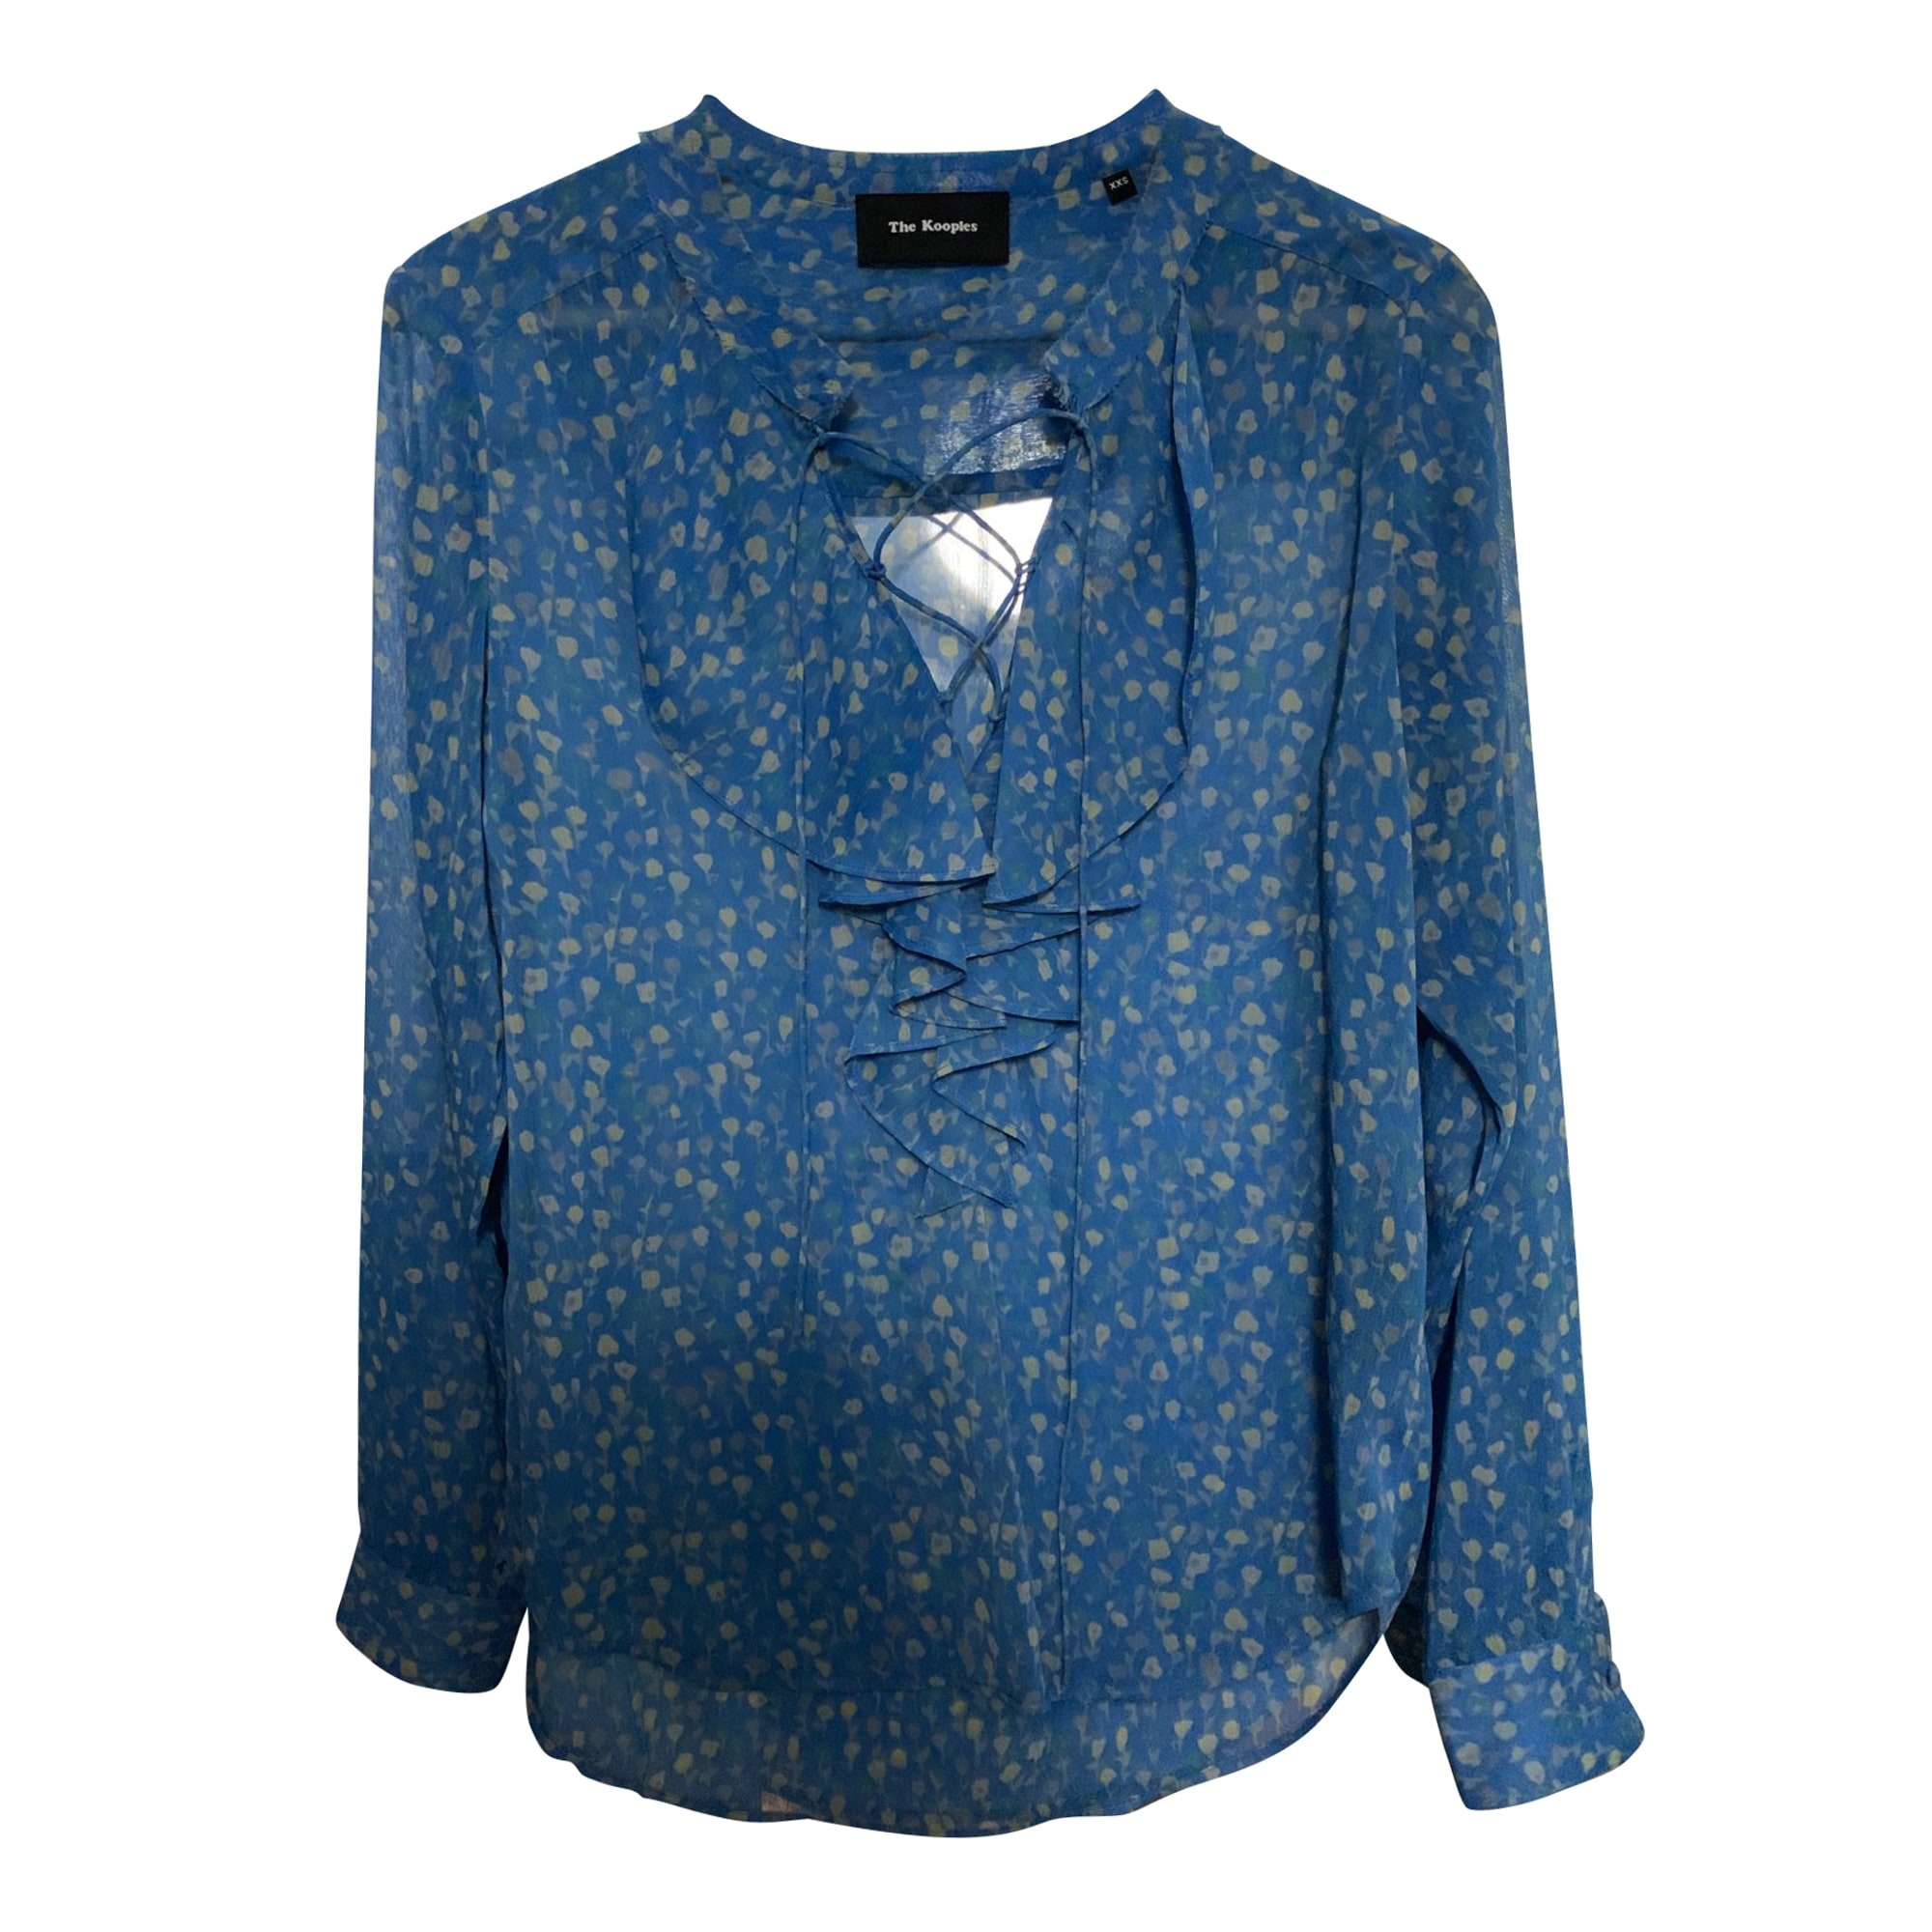 Blouse THE KOOPLES Bleu, bleu marine, bleu turquoise